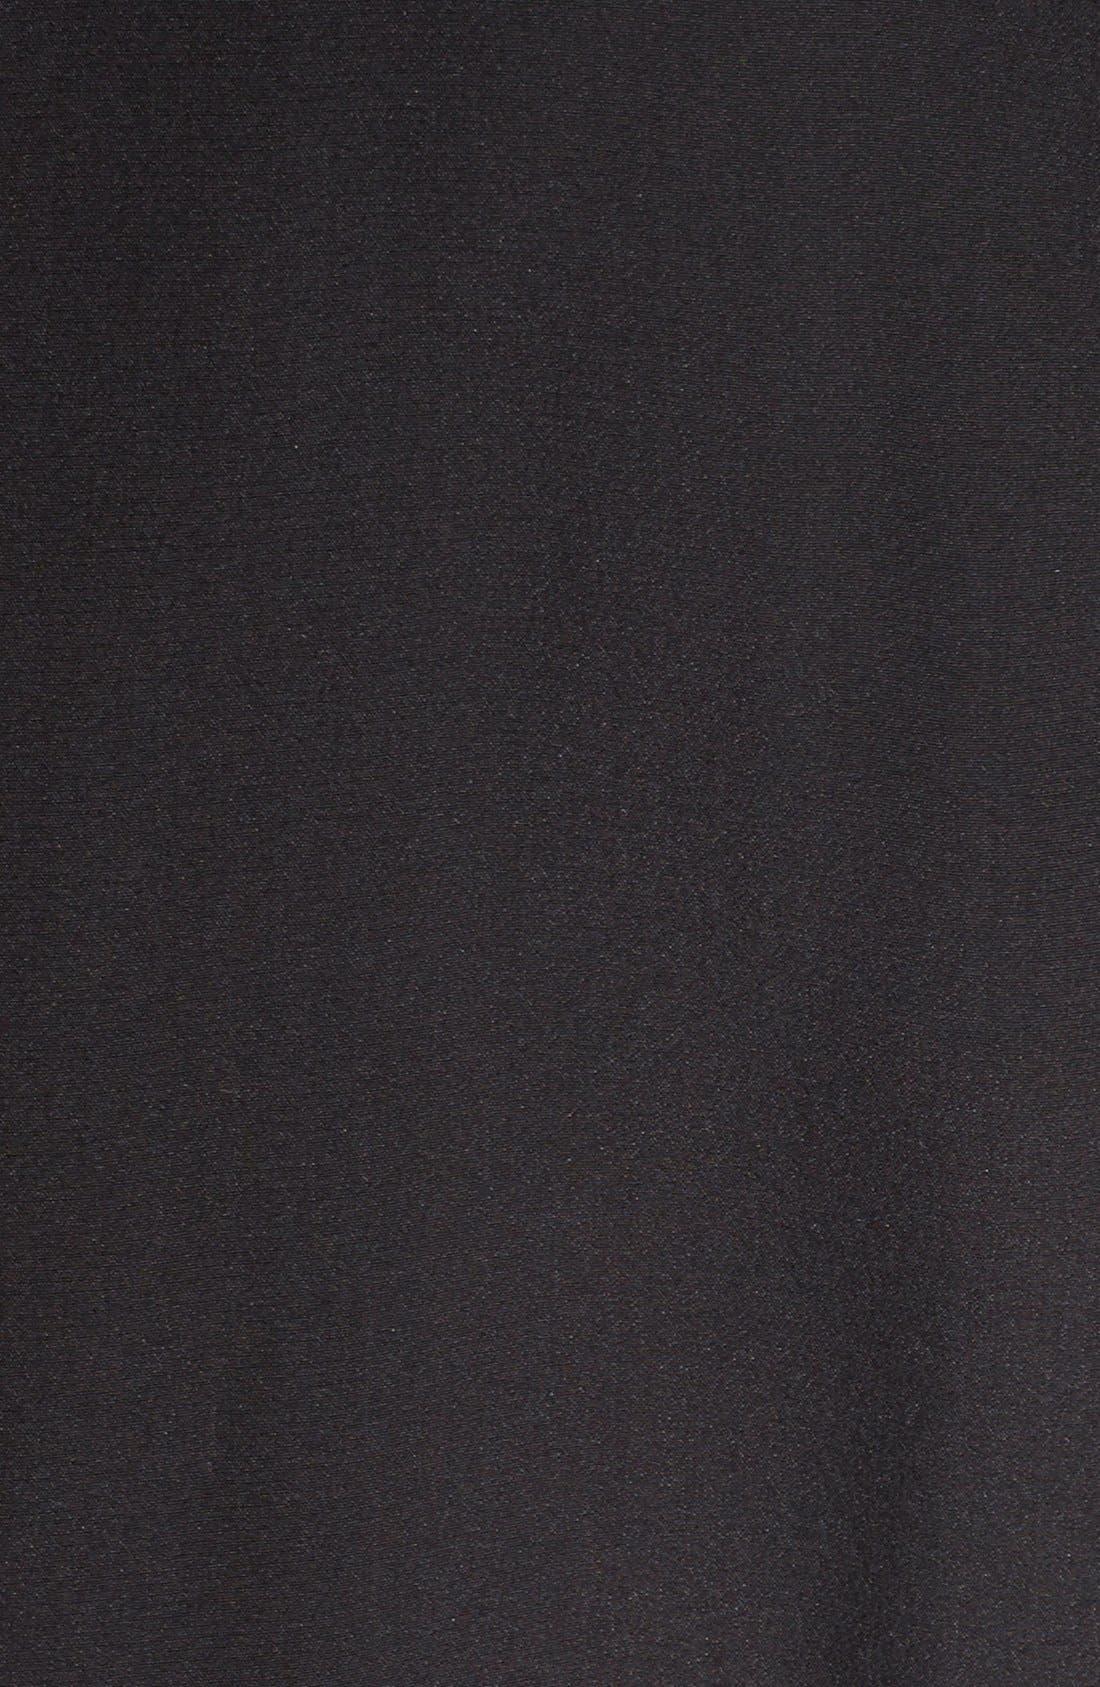 Alternate Image 3  - Elizabeth andJames 'Sasha'Silk Top